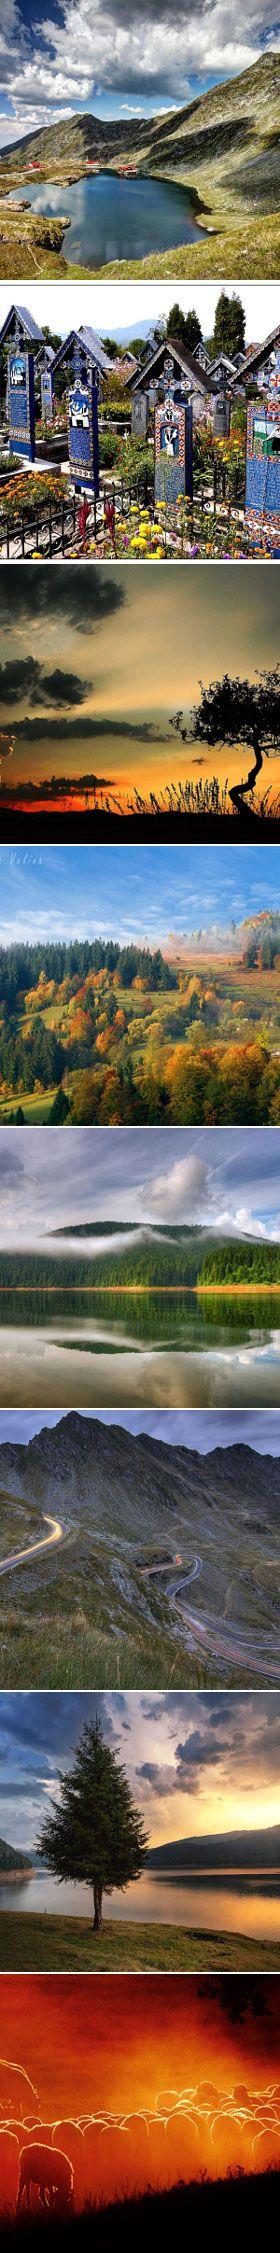 This is Romania!